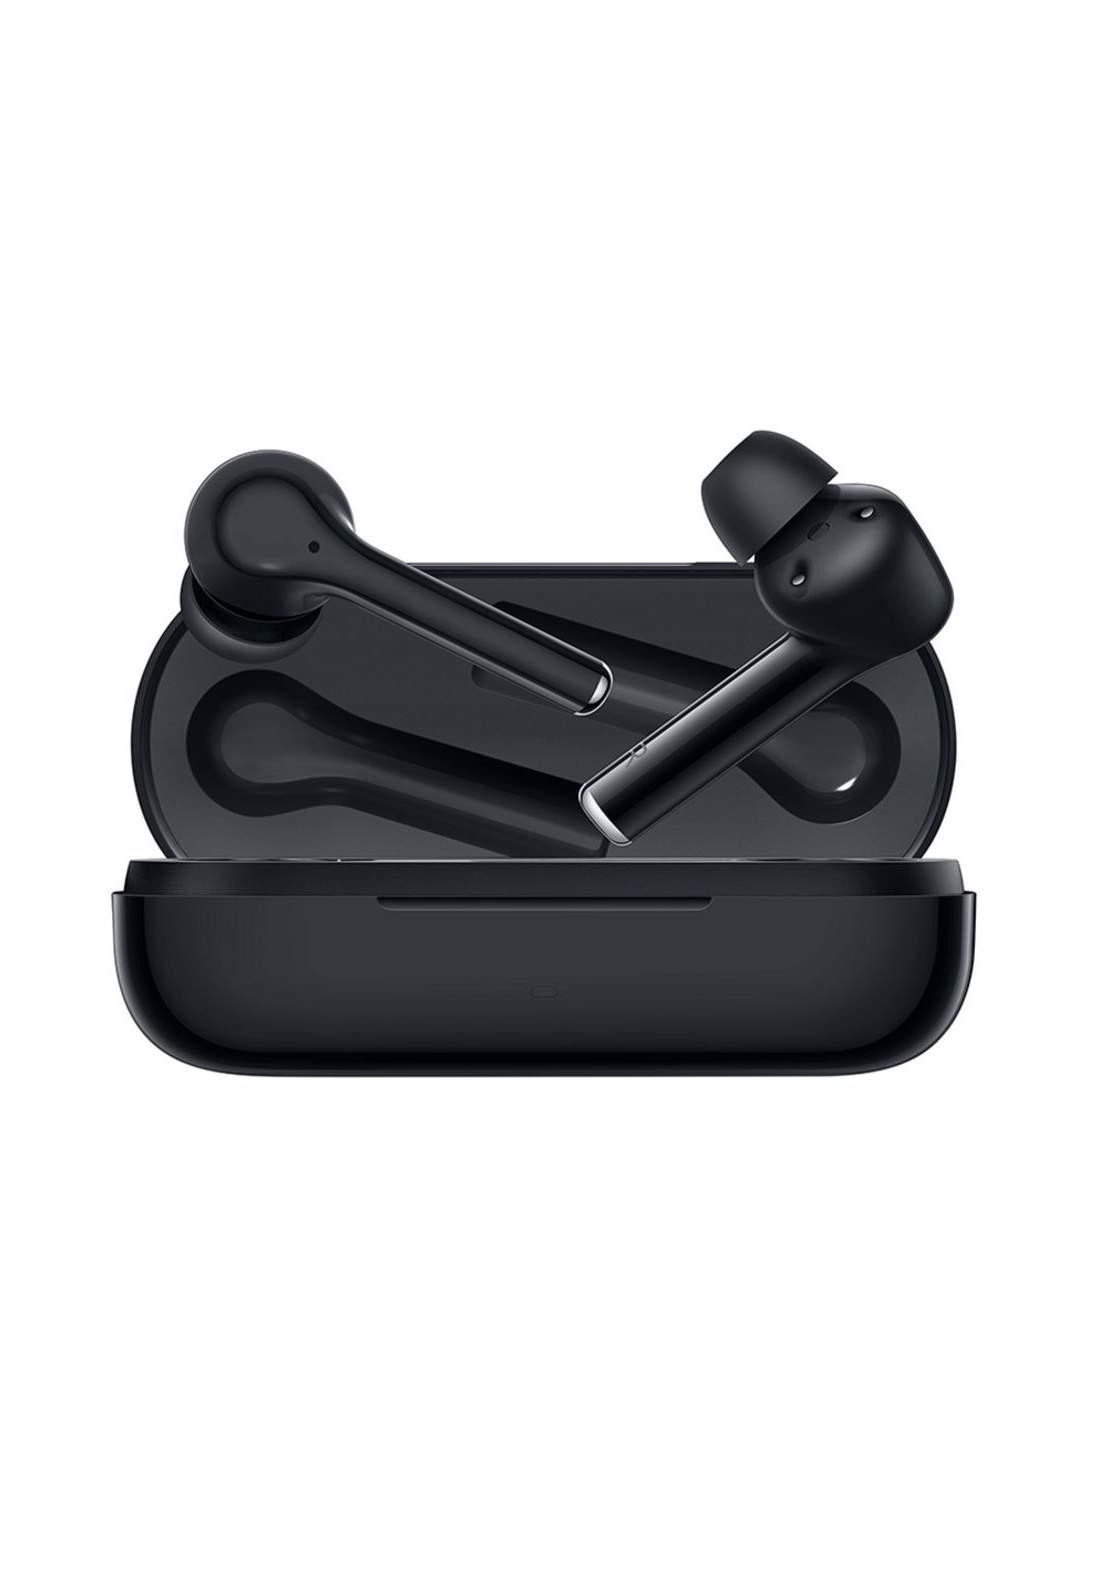 Huawei Freebuds 3i Bluetooth Headphones-Black